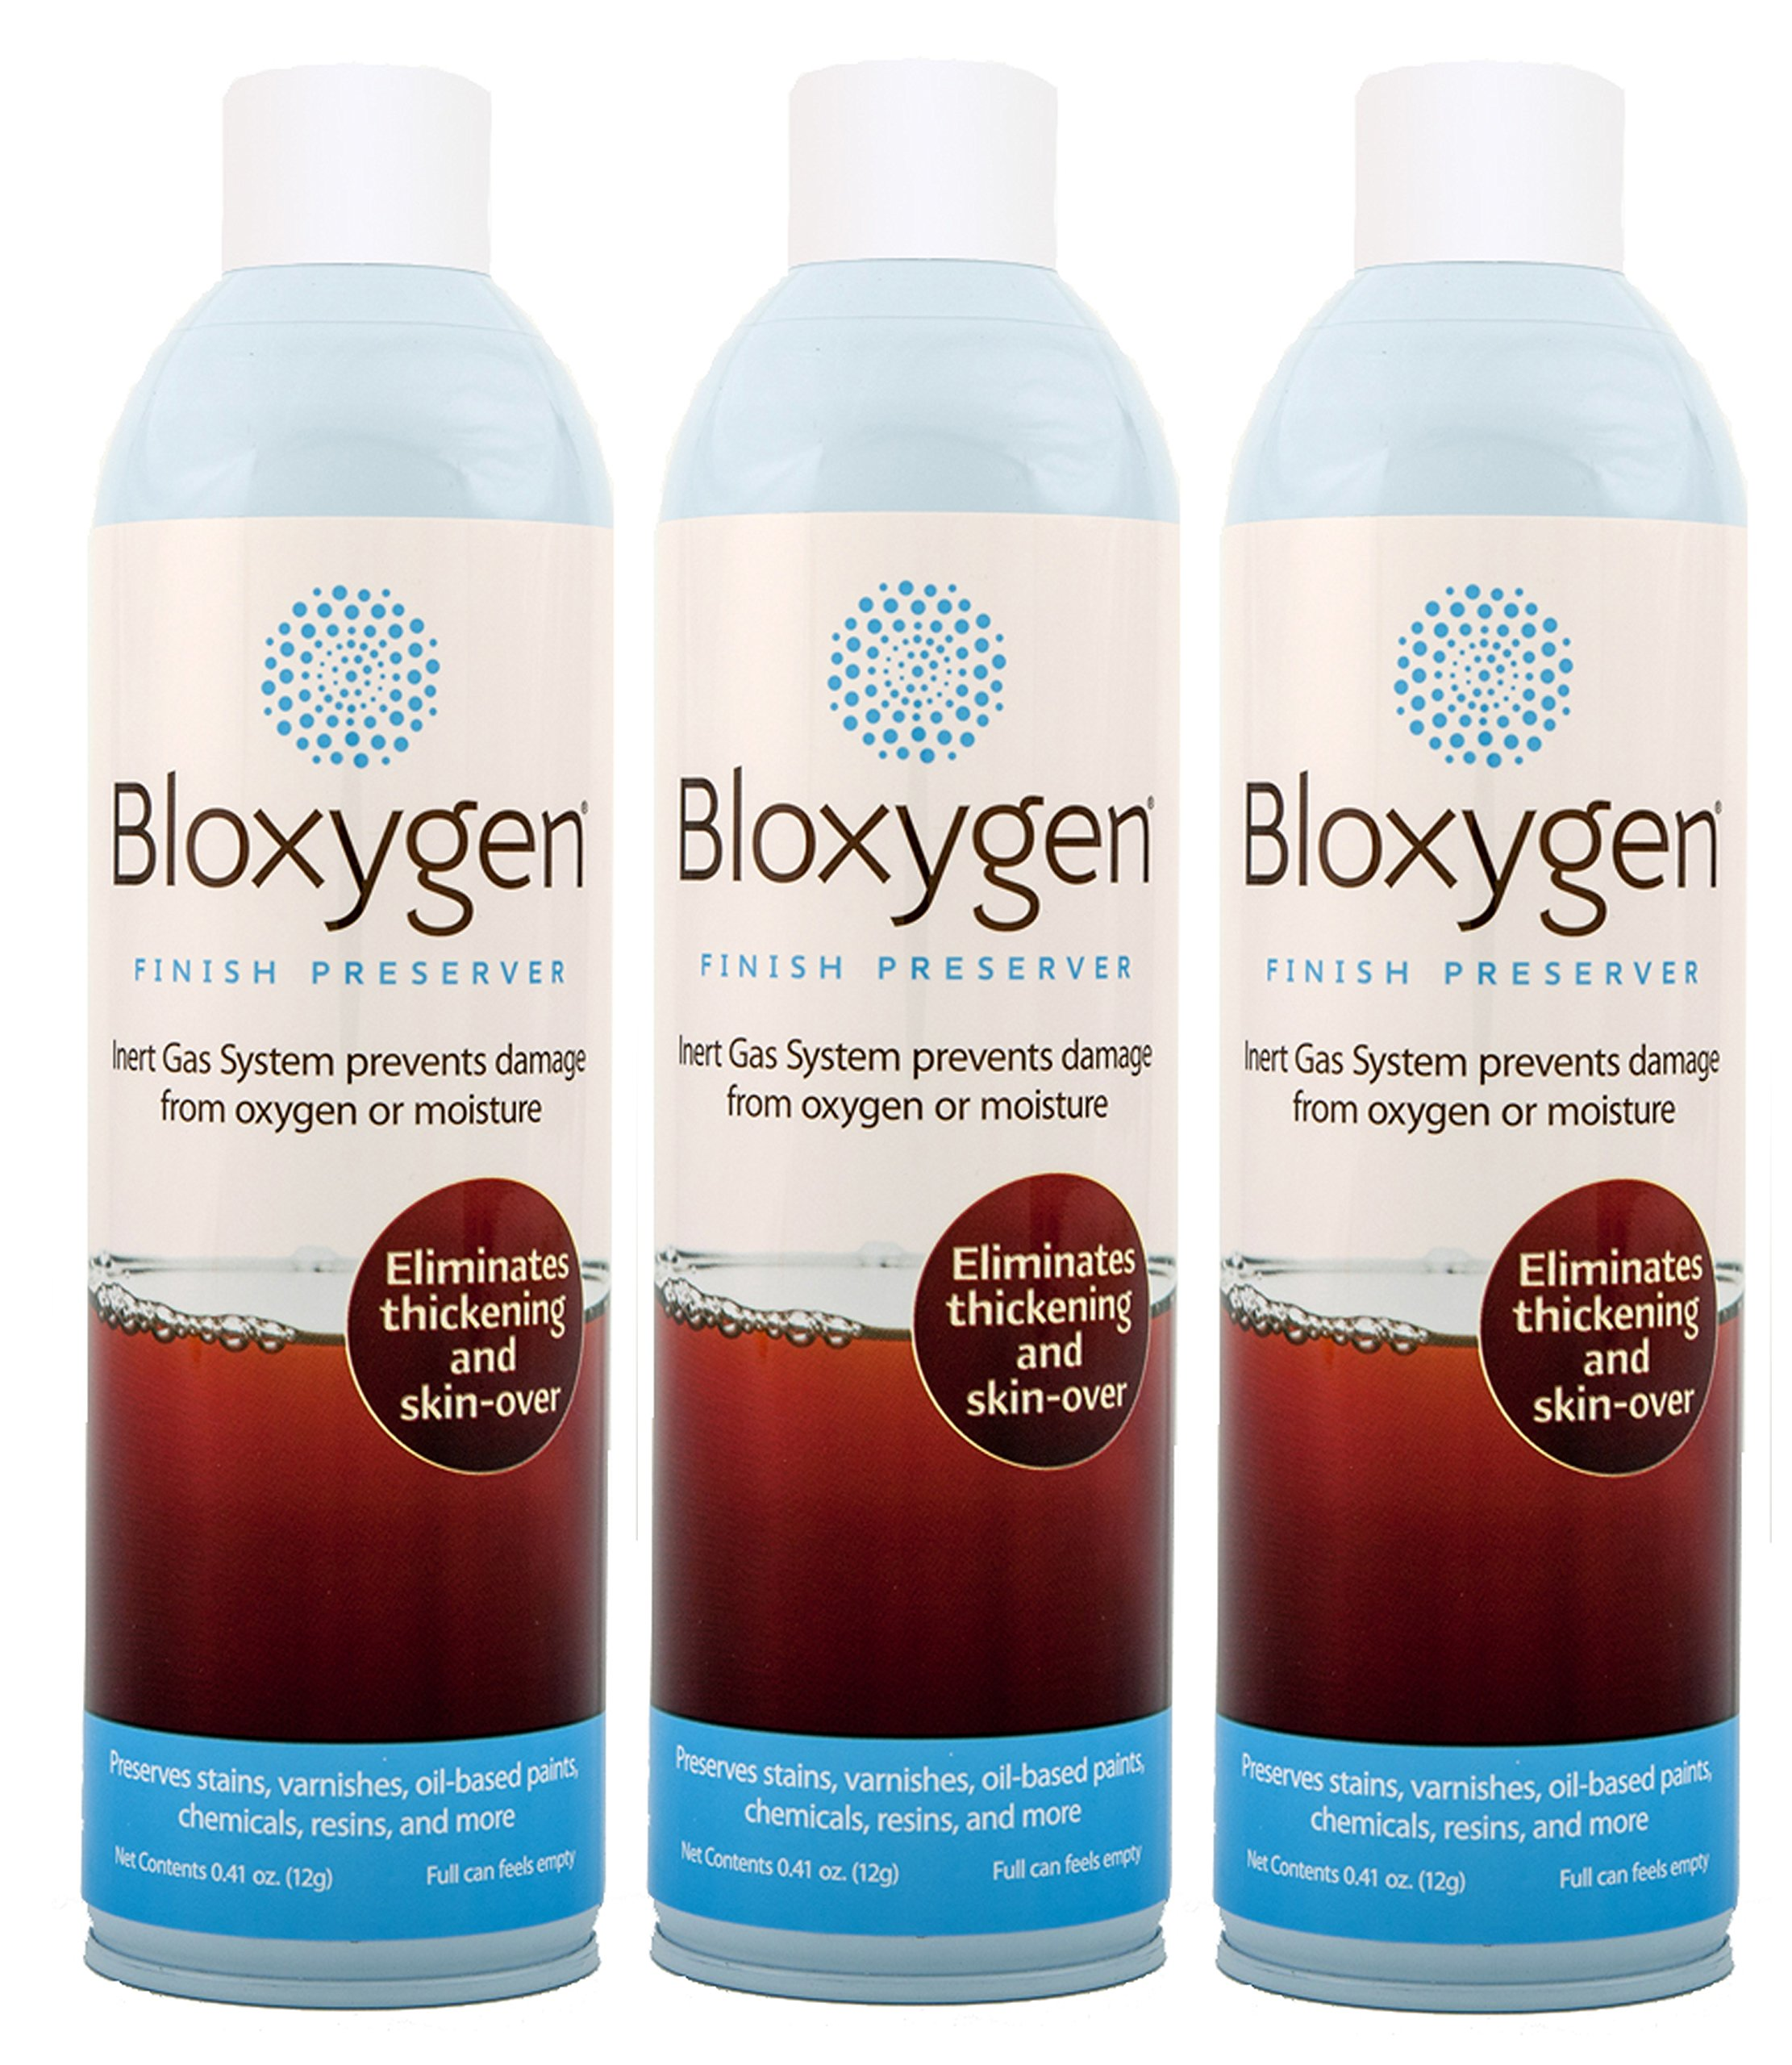 IronWood Designs - Bloxygen Preserver, 3 Can